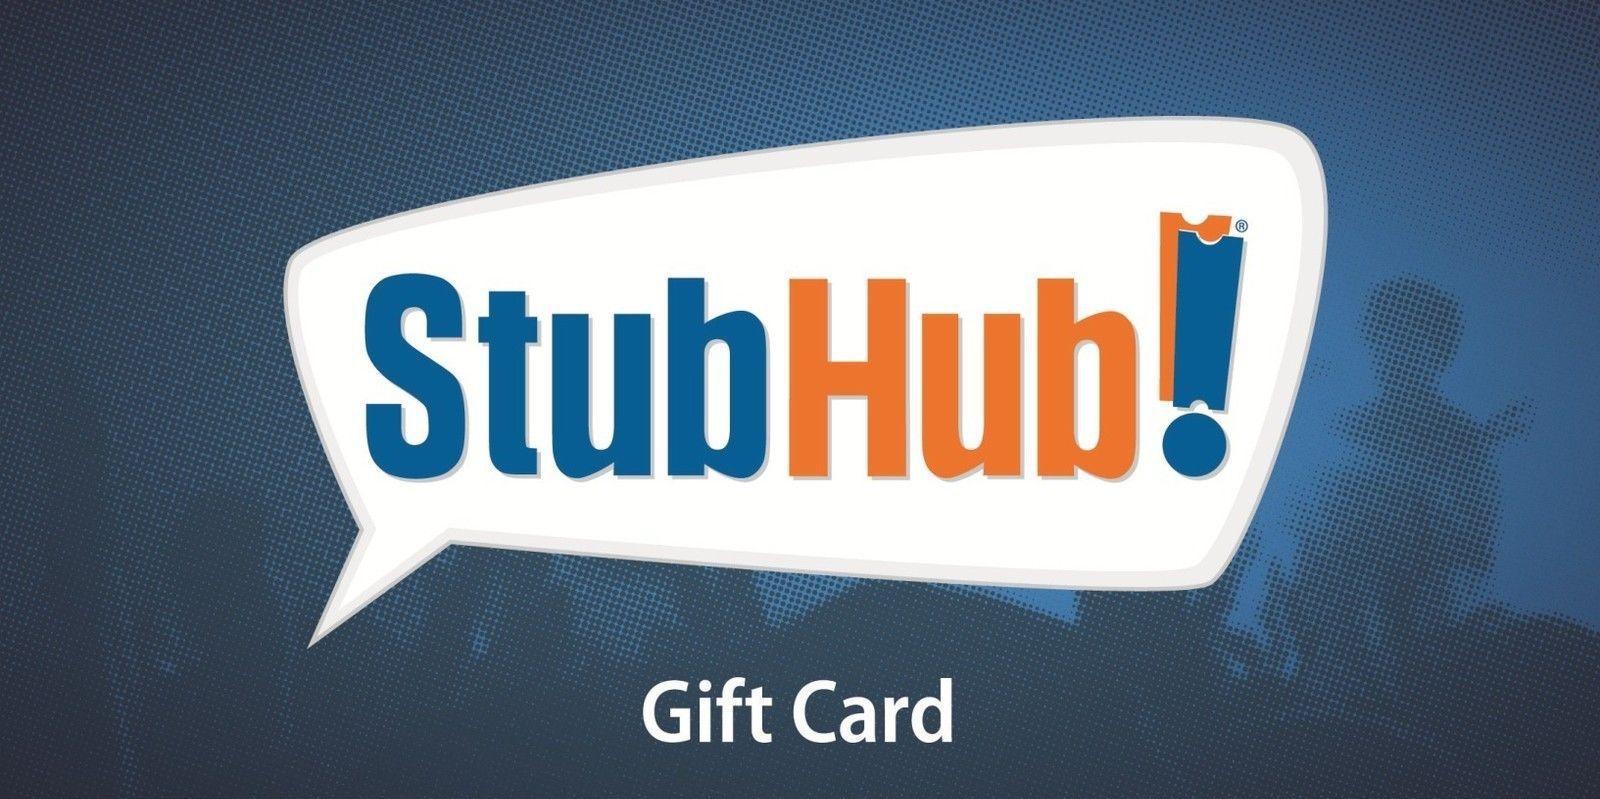 stubhub-gift-card-01